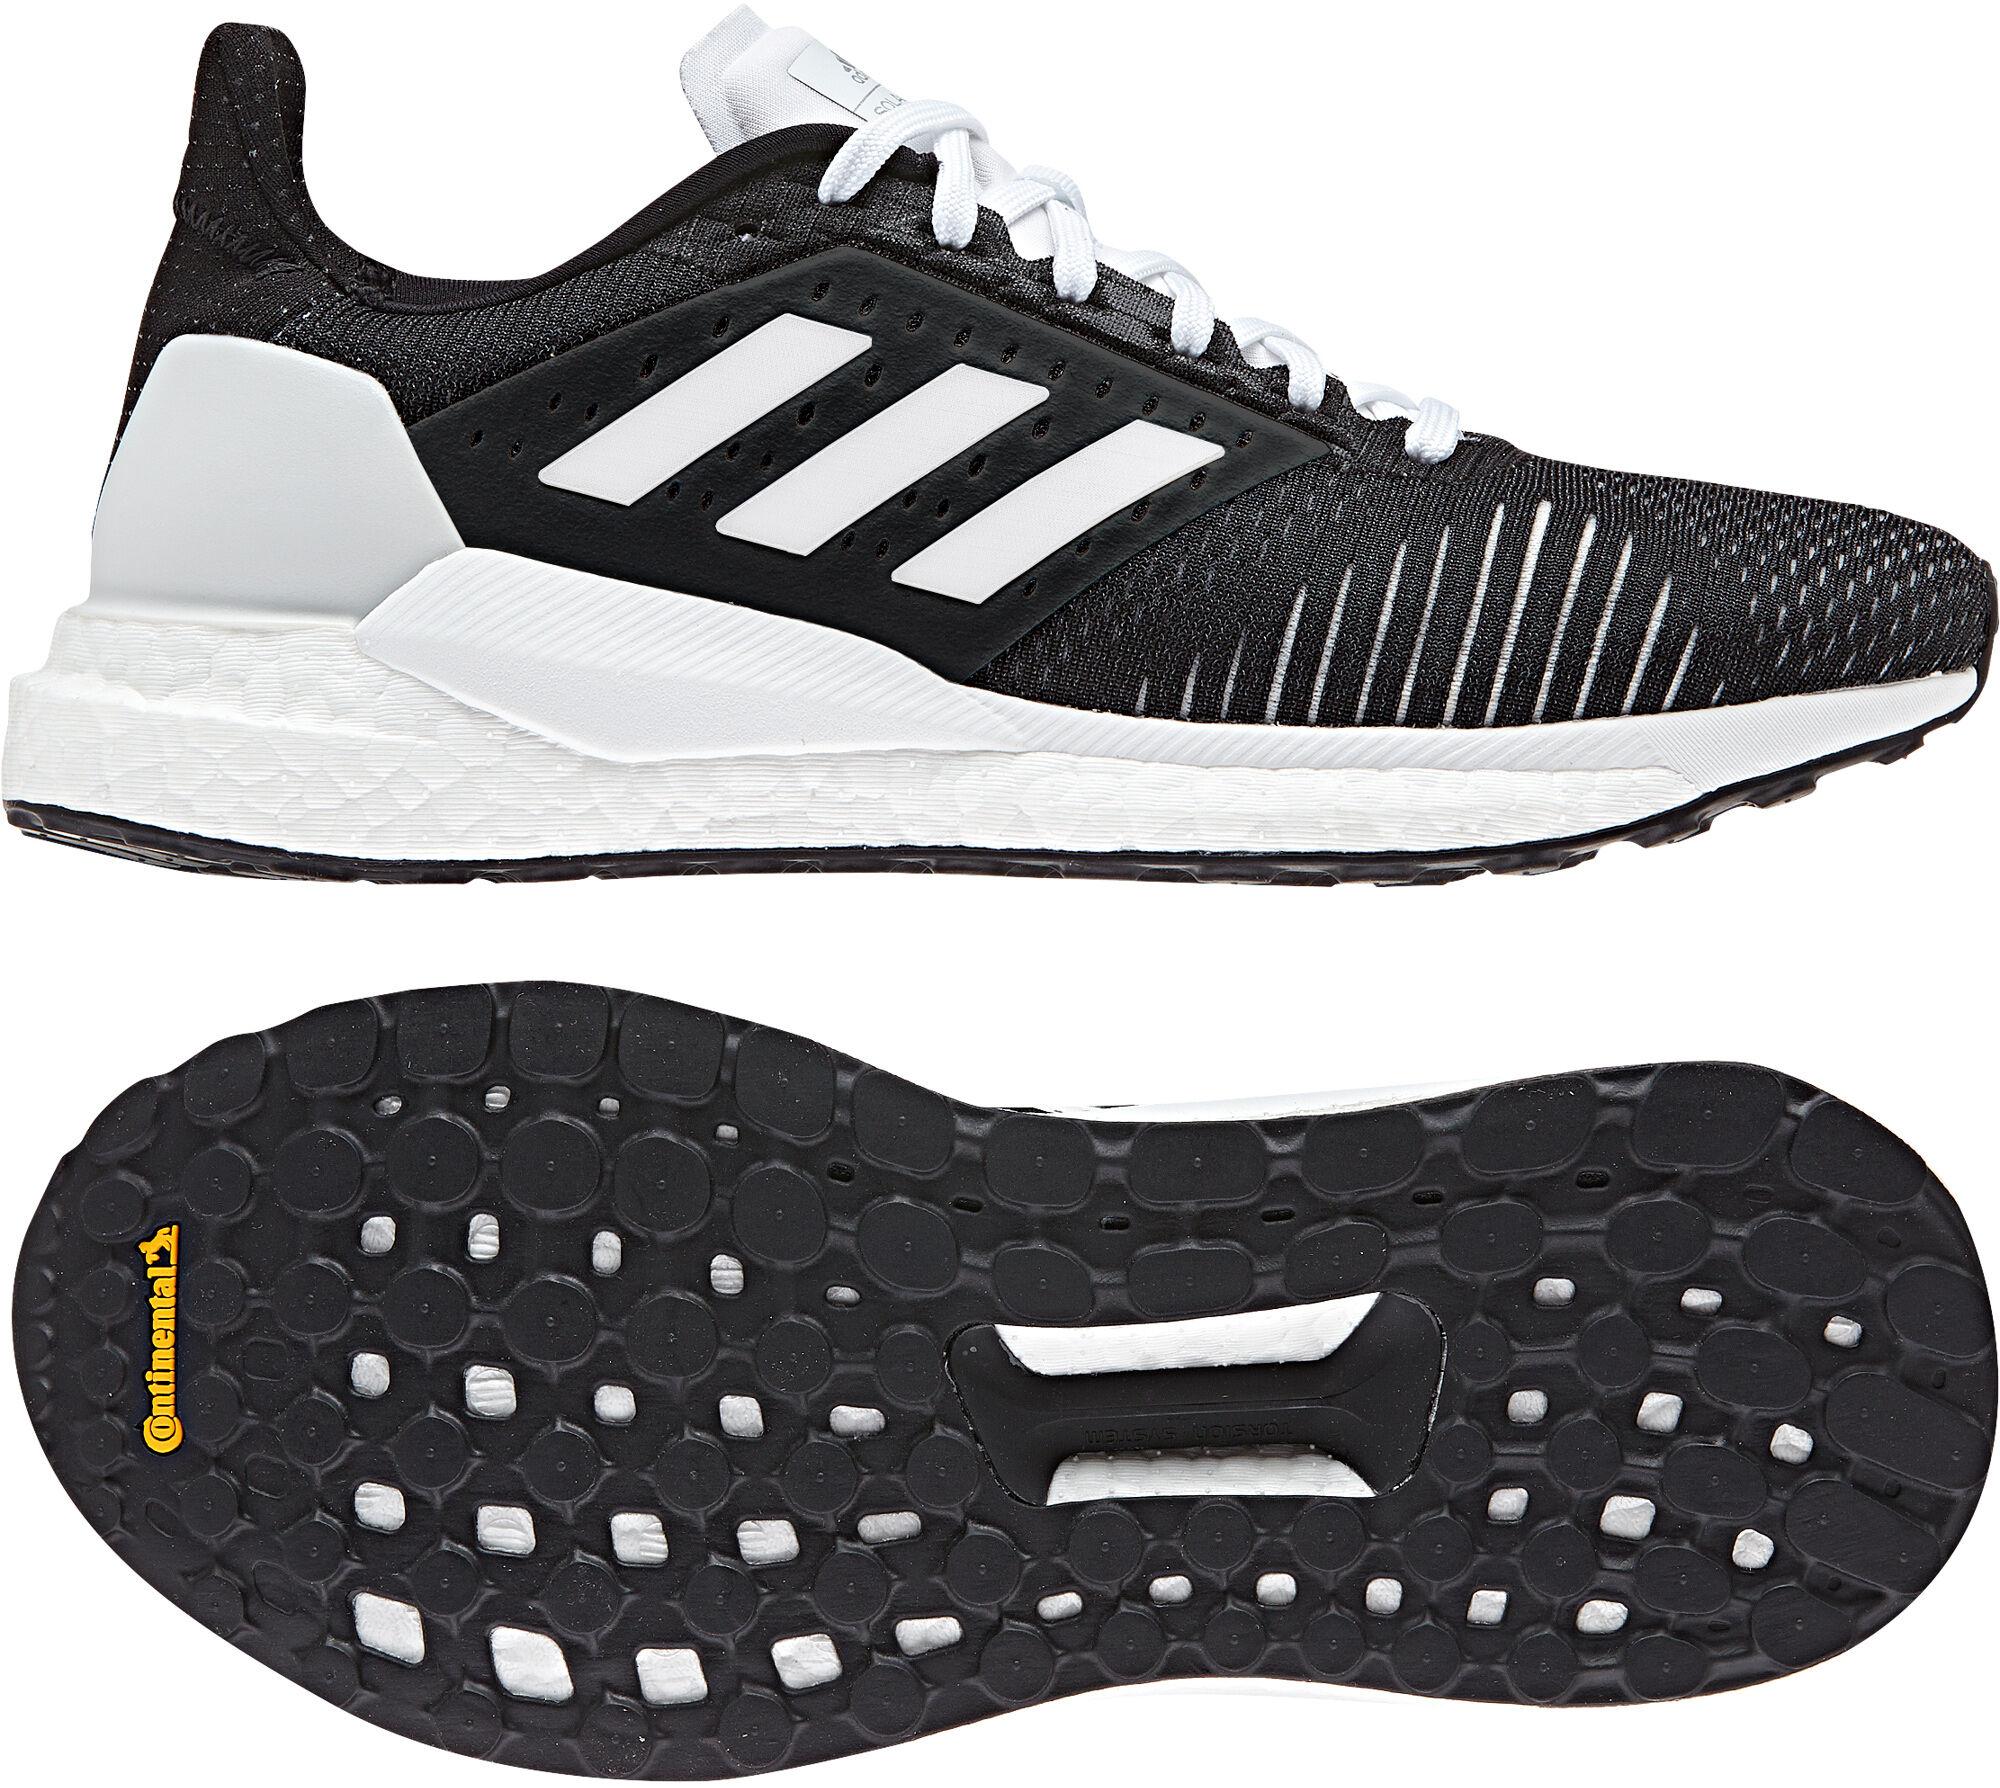 Adidas Solar Glide ST sko, black/white/silver, 42